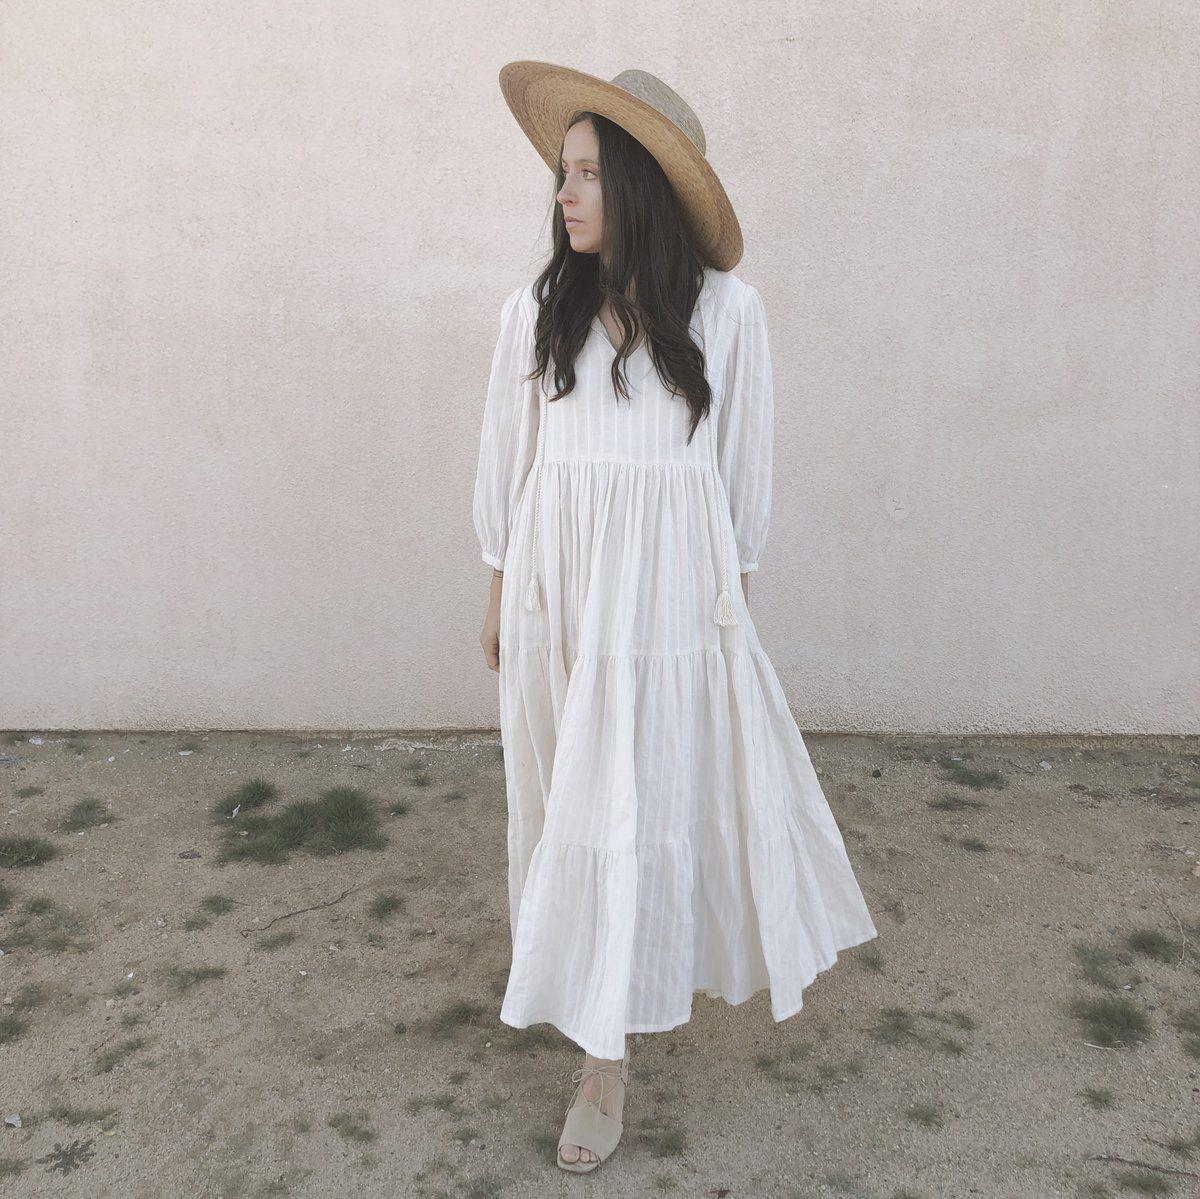 Pin By Kay Harless On Style In 2021 Cotton Gauze Dress White Flowy Dress White Boho Dress [ 1199 x 1200 Pixel ]